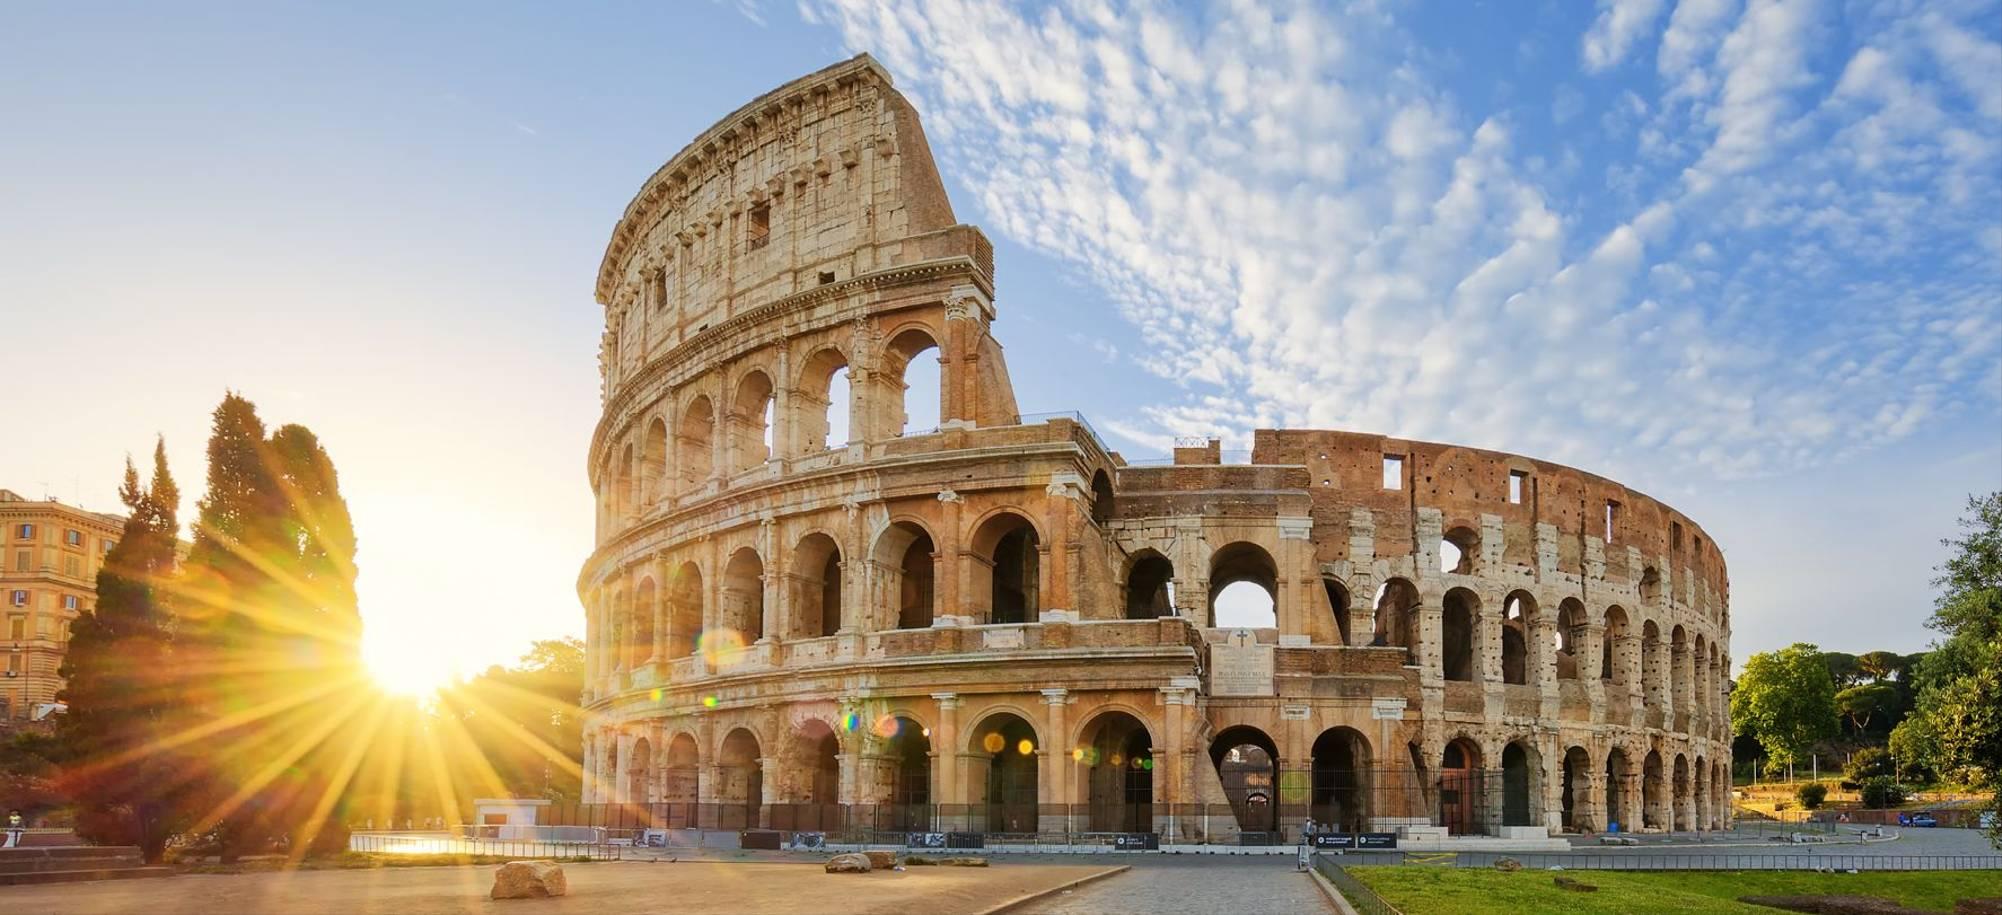 Rome   Colosseum   Itinerary Desktop